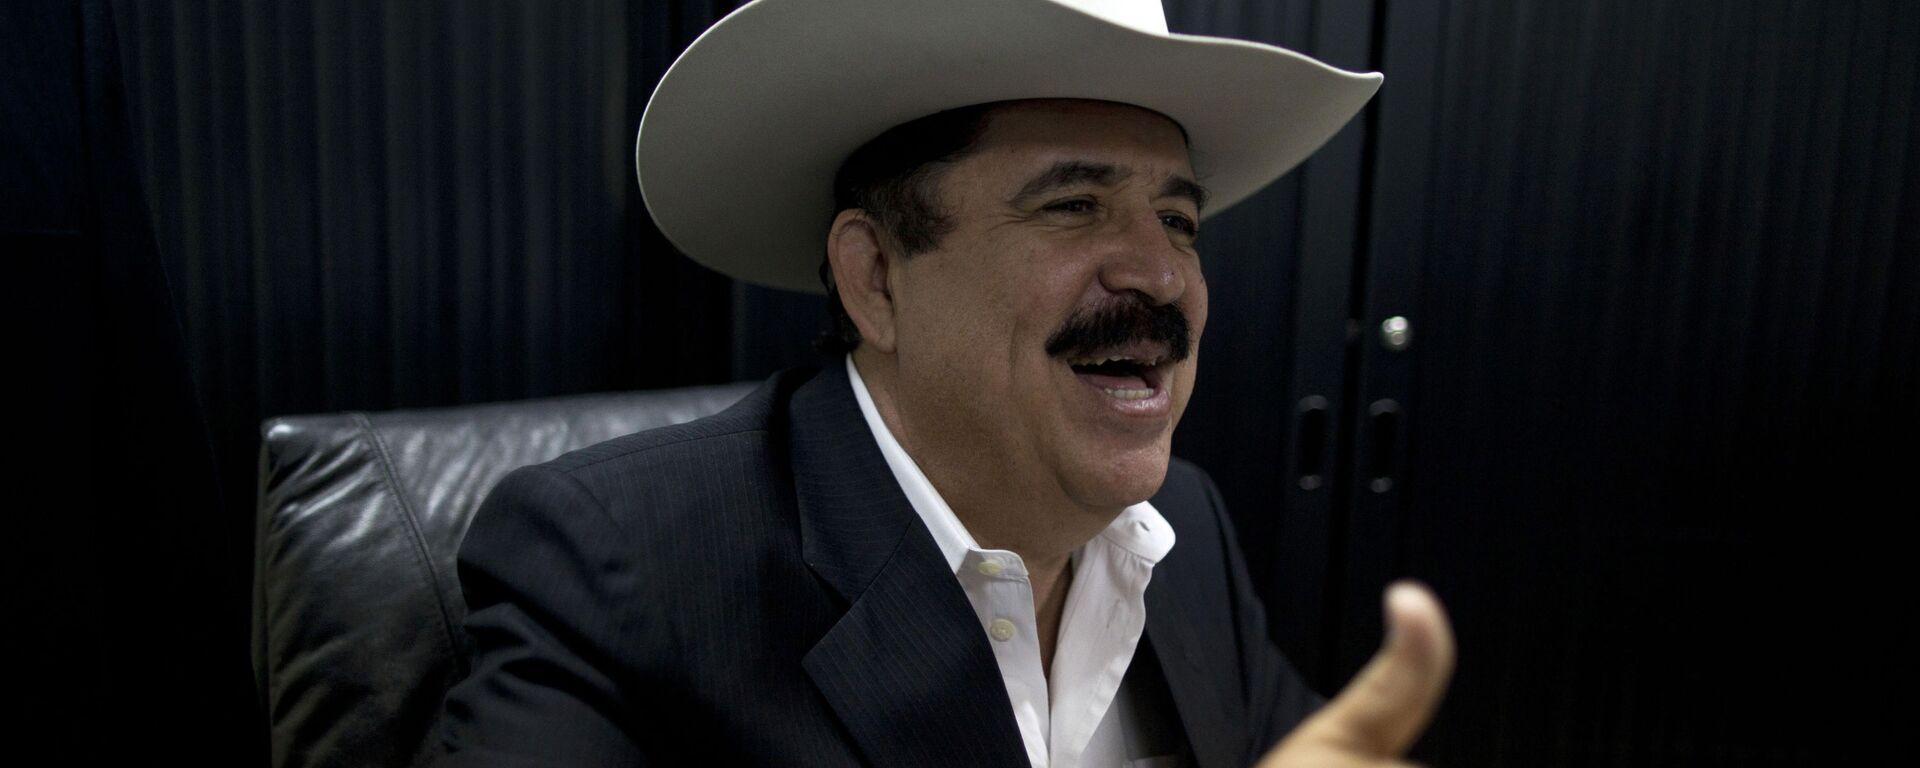 Manuel Zelaya, expresidente de Honduras - Sputnik Mundo, 1920, 15.07.2021